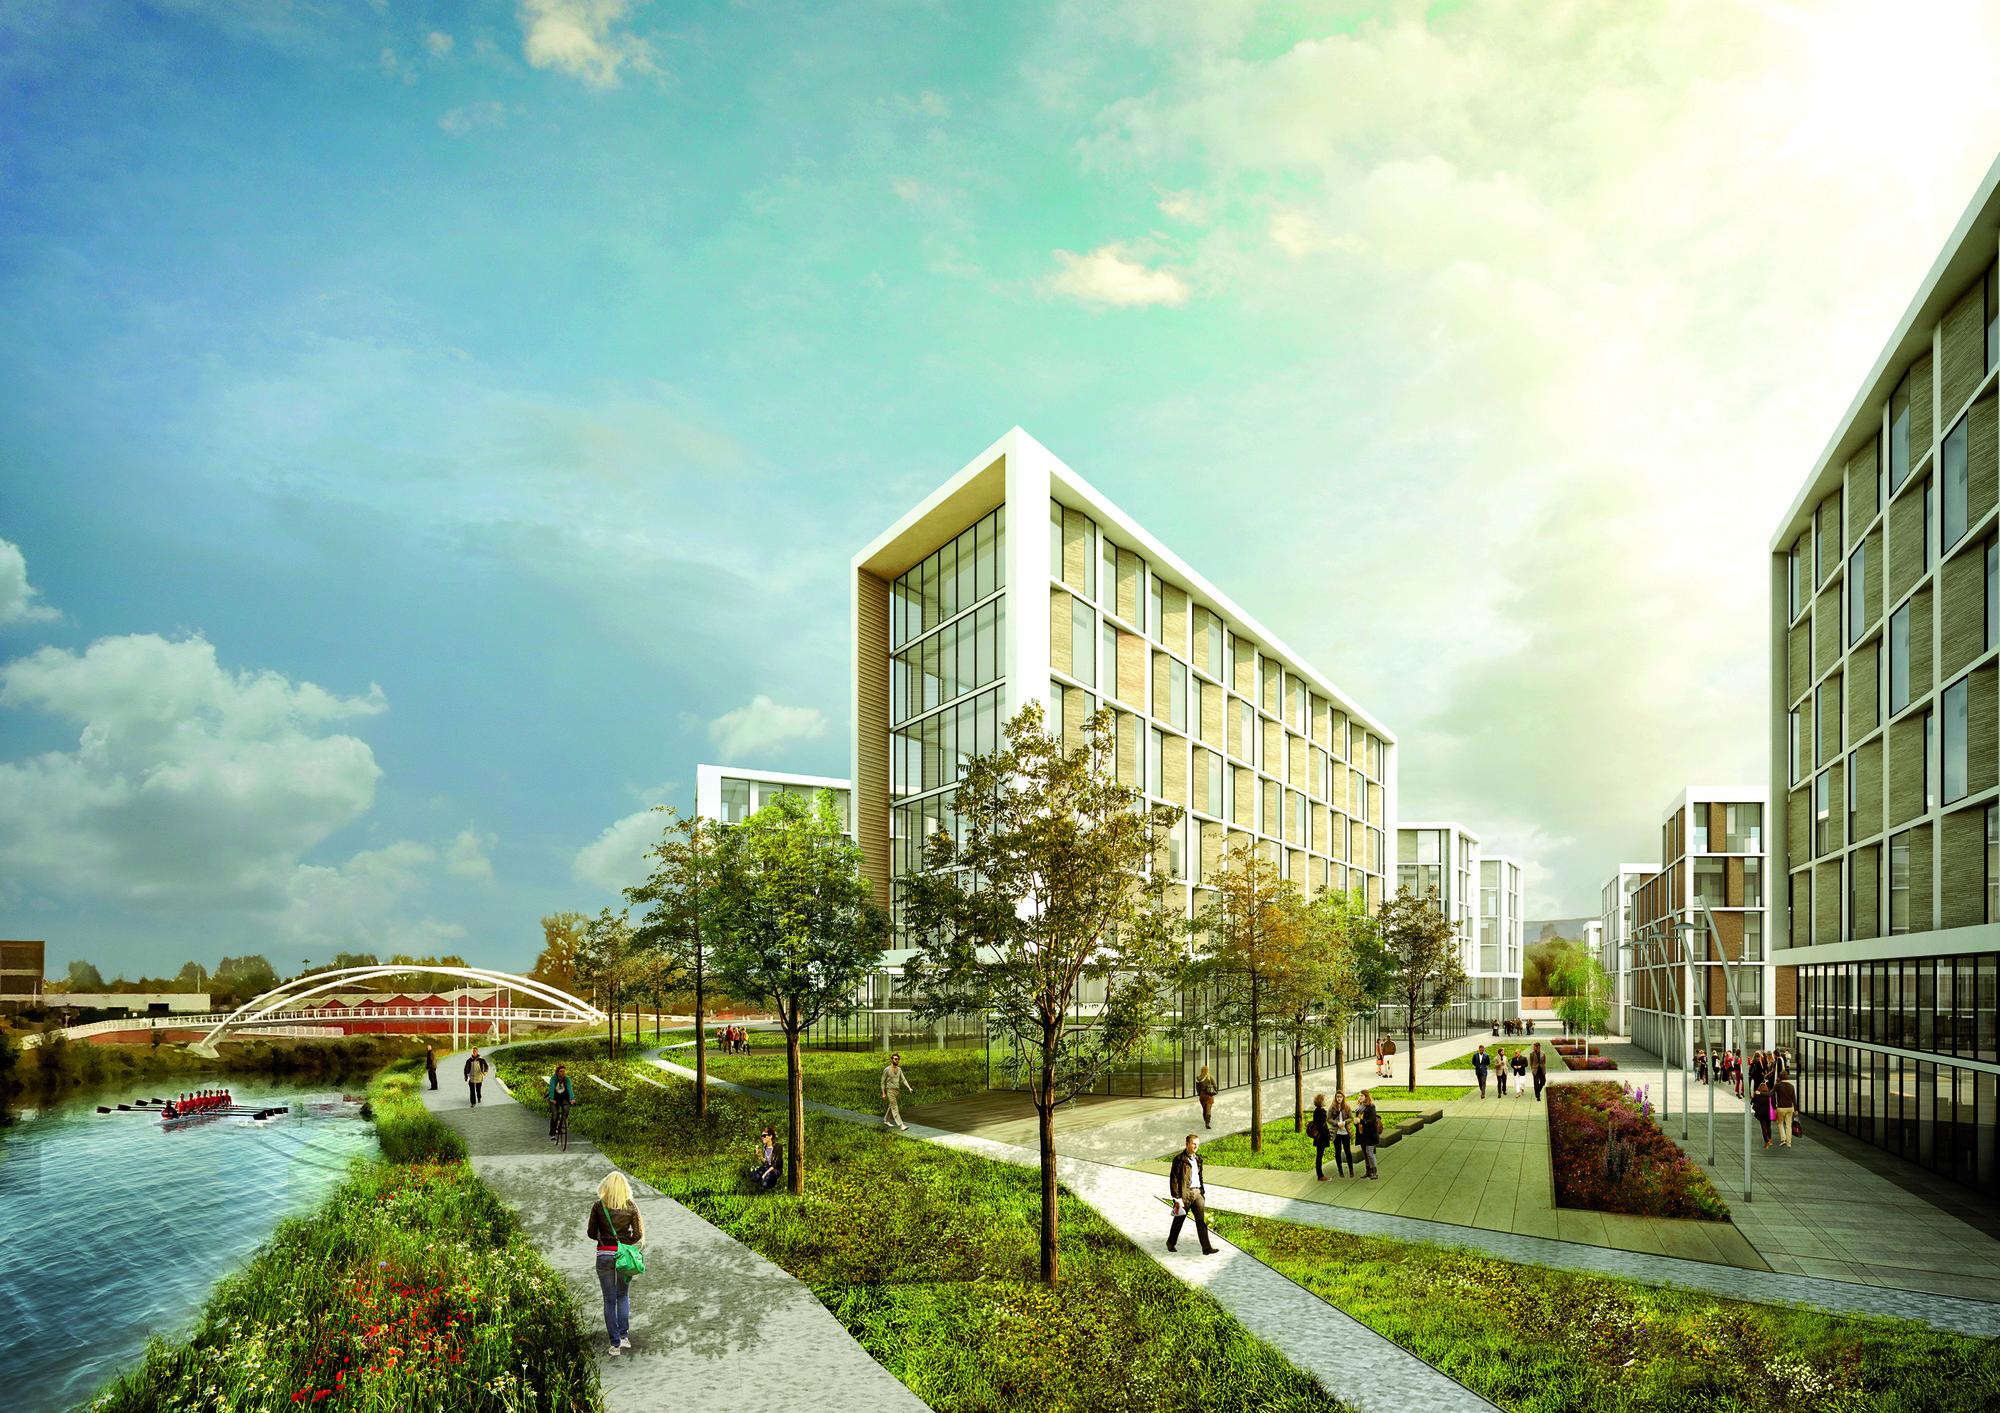 7N Architects Reveal Glasgow Masterplan, Courtesy of 7N Architects